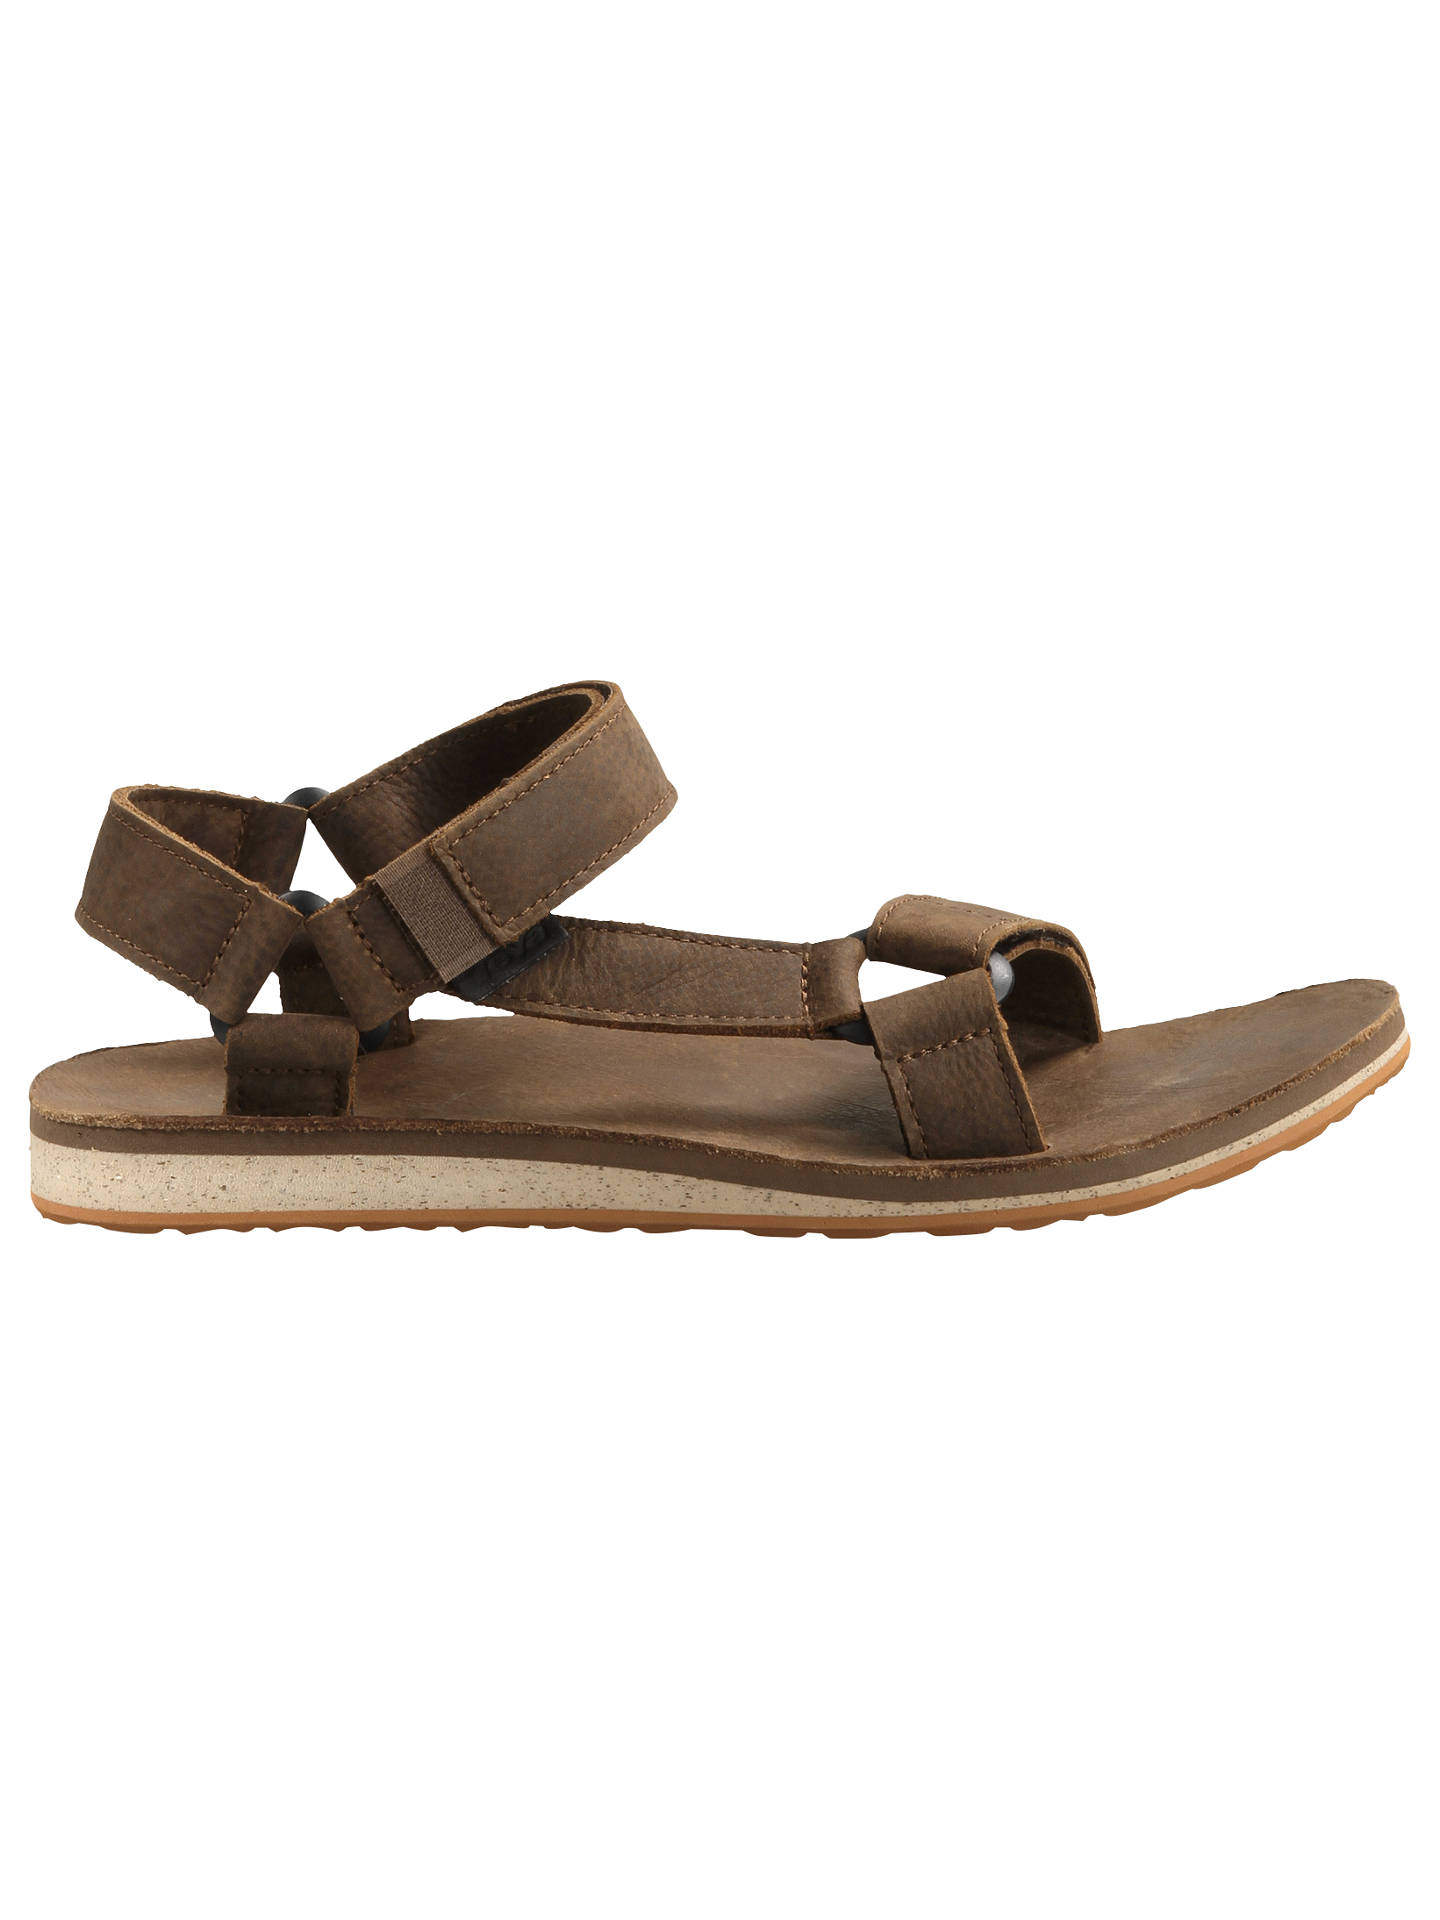 9b7c6616eef2 Buy Teva Original Universal Premium Leather Men s Sandals